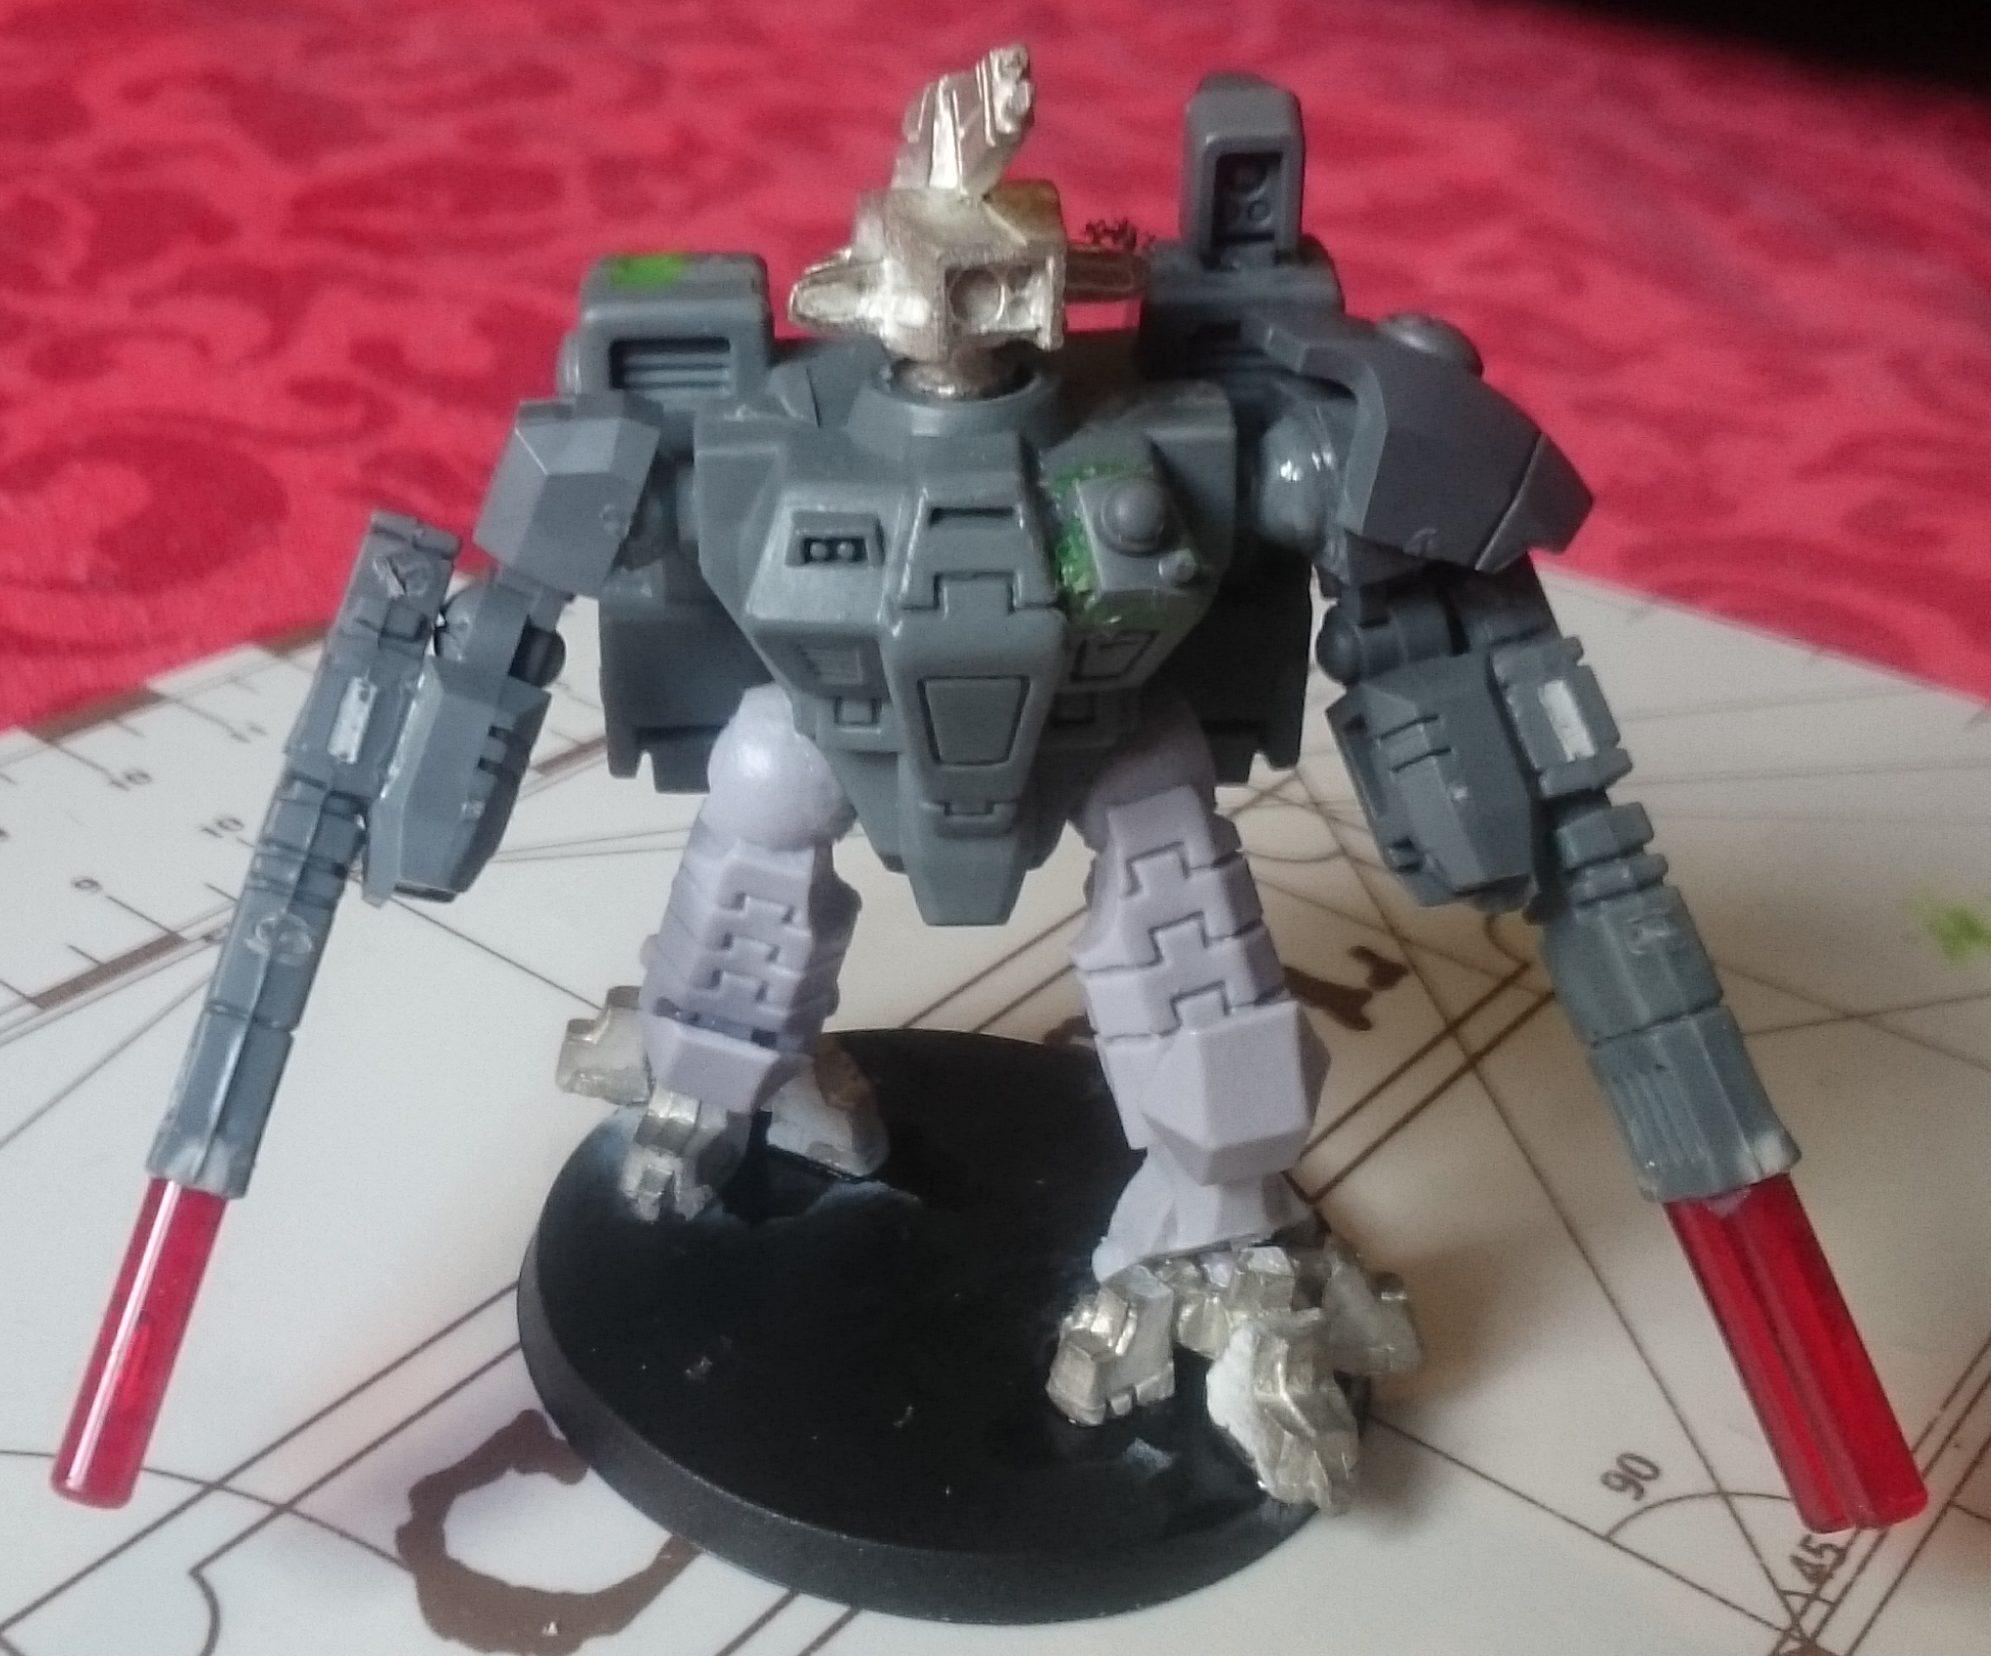 Commander Brightsword